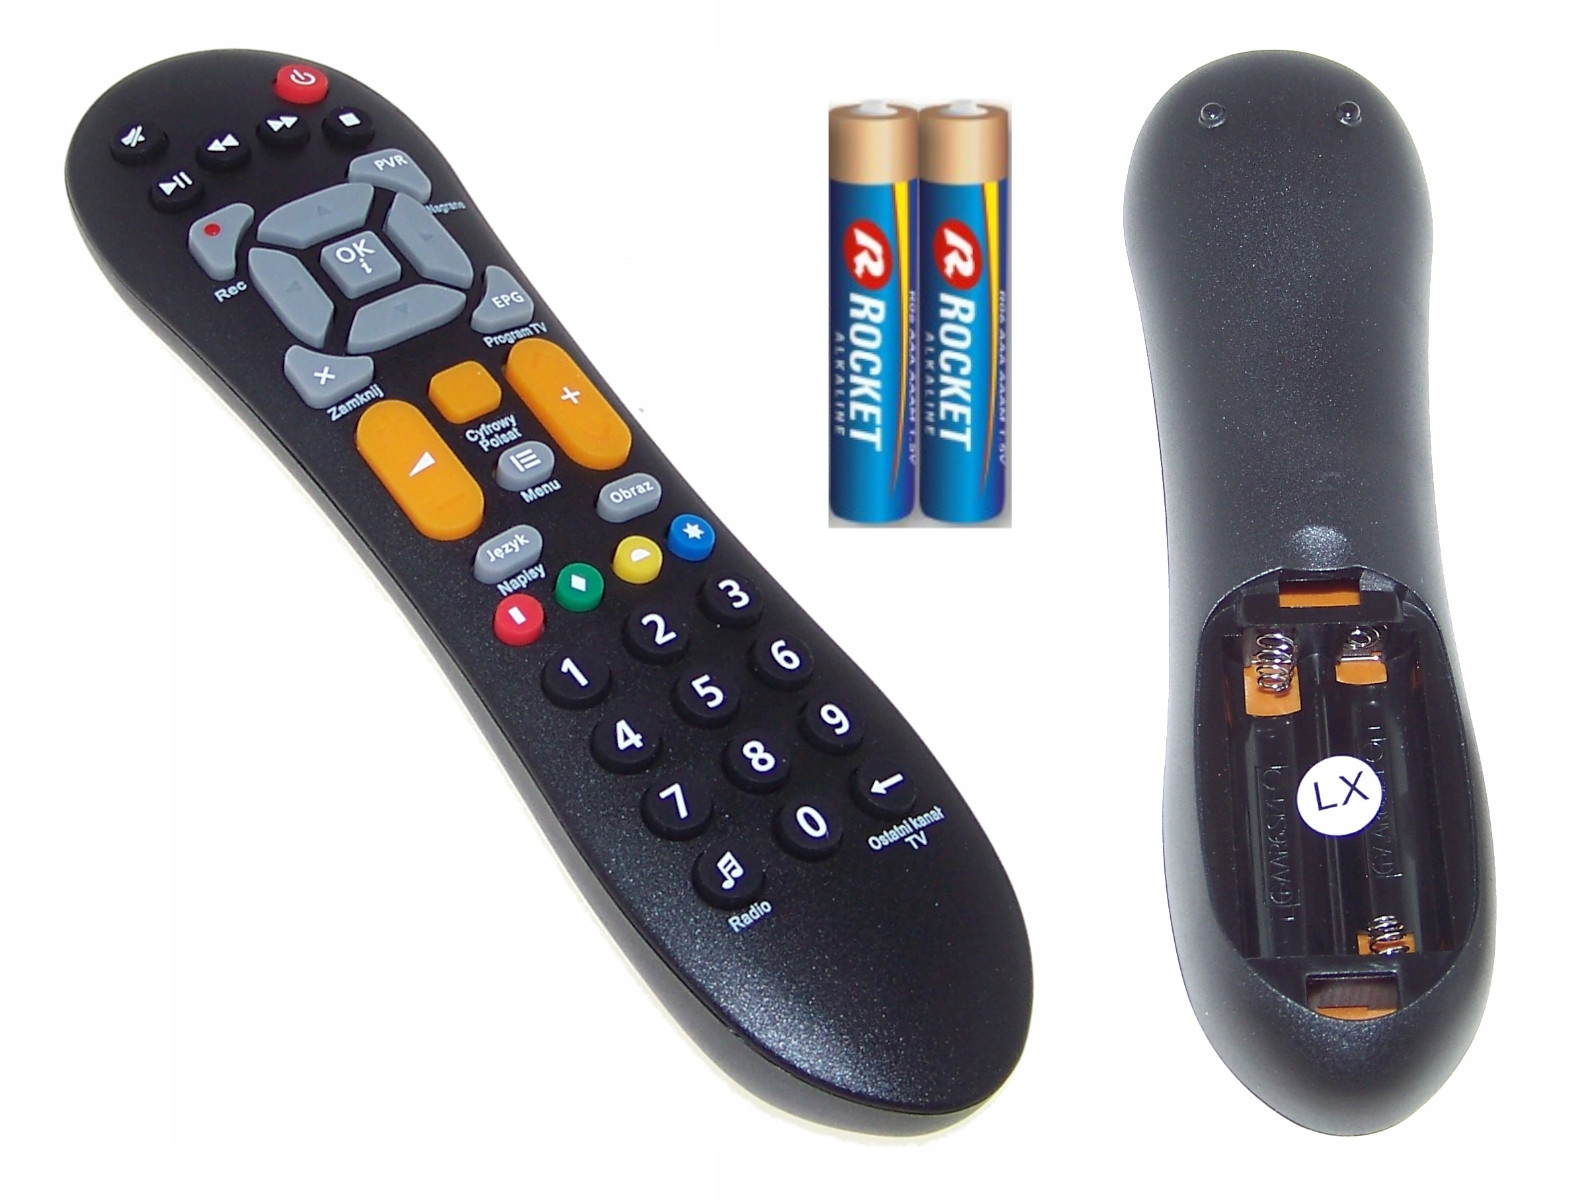 НОВЫЙ ЦИФРОВОЙ ПИЛОТ POLSAT HD7000 HD6000 HD5500S